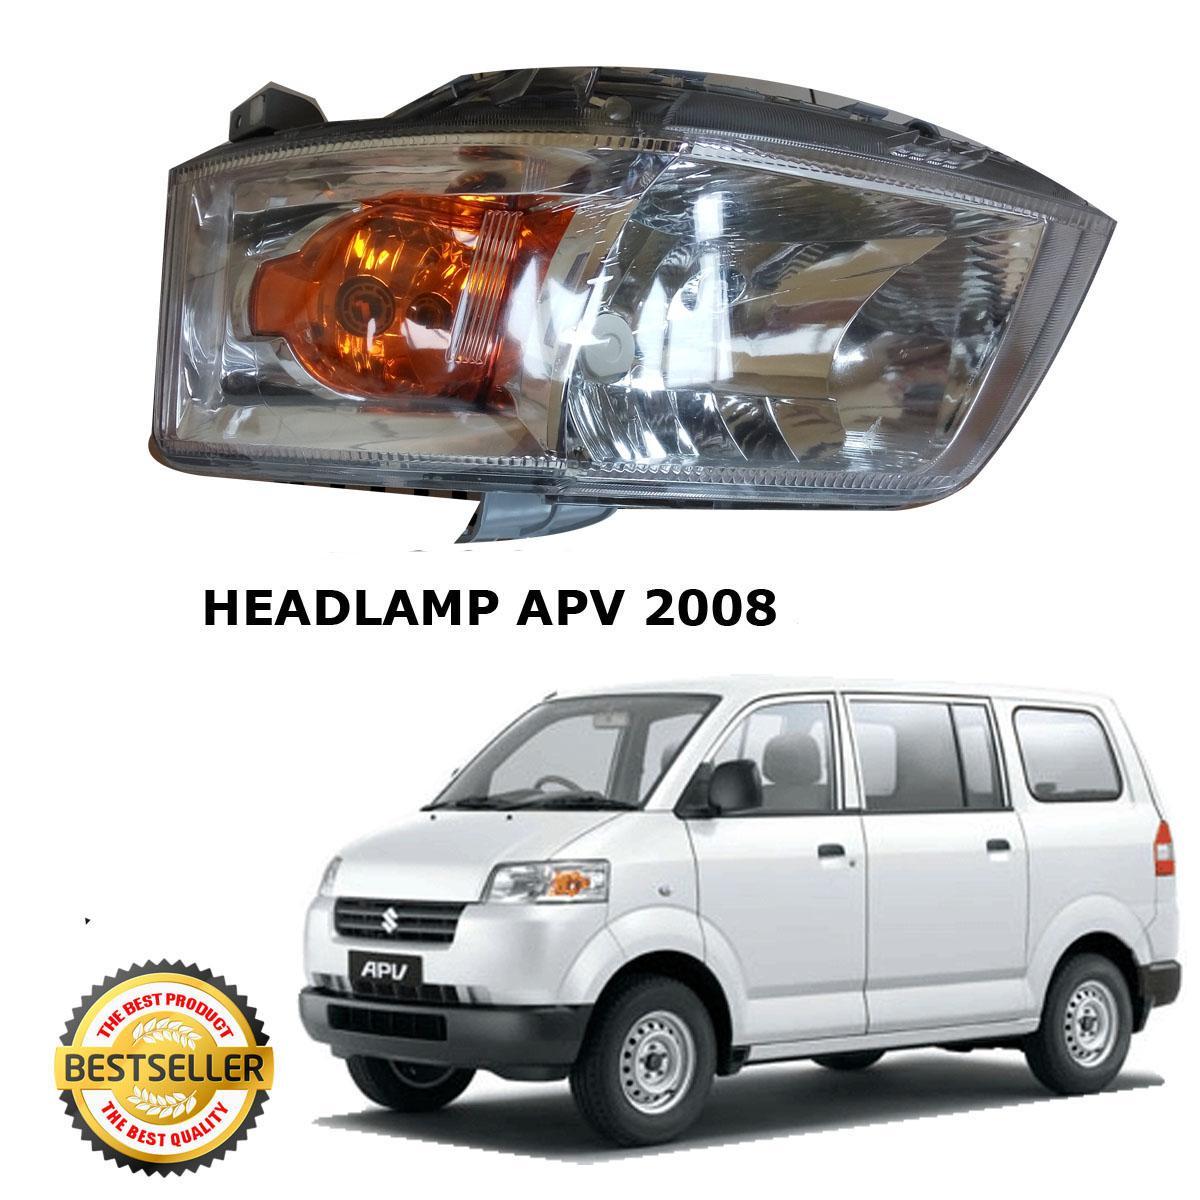 APV TH 2008 - 1 Pcs Headlamp Dmac Mobil SUZUKI APV 08 - Kanan